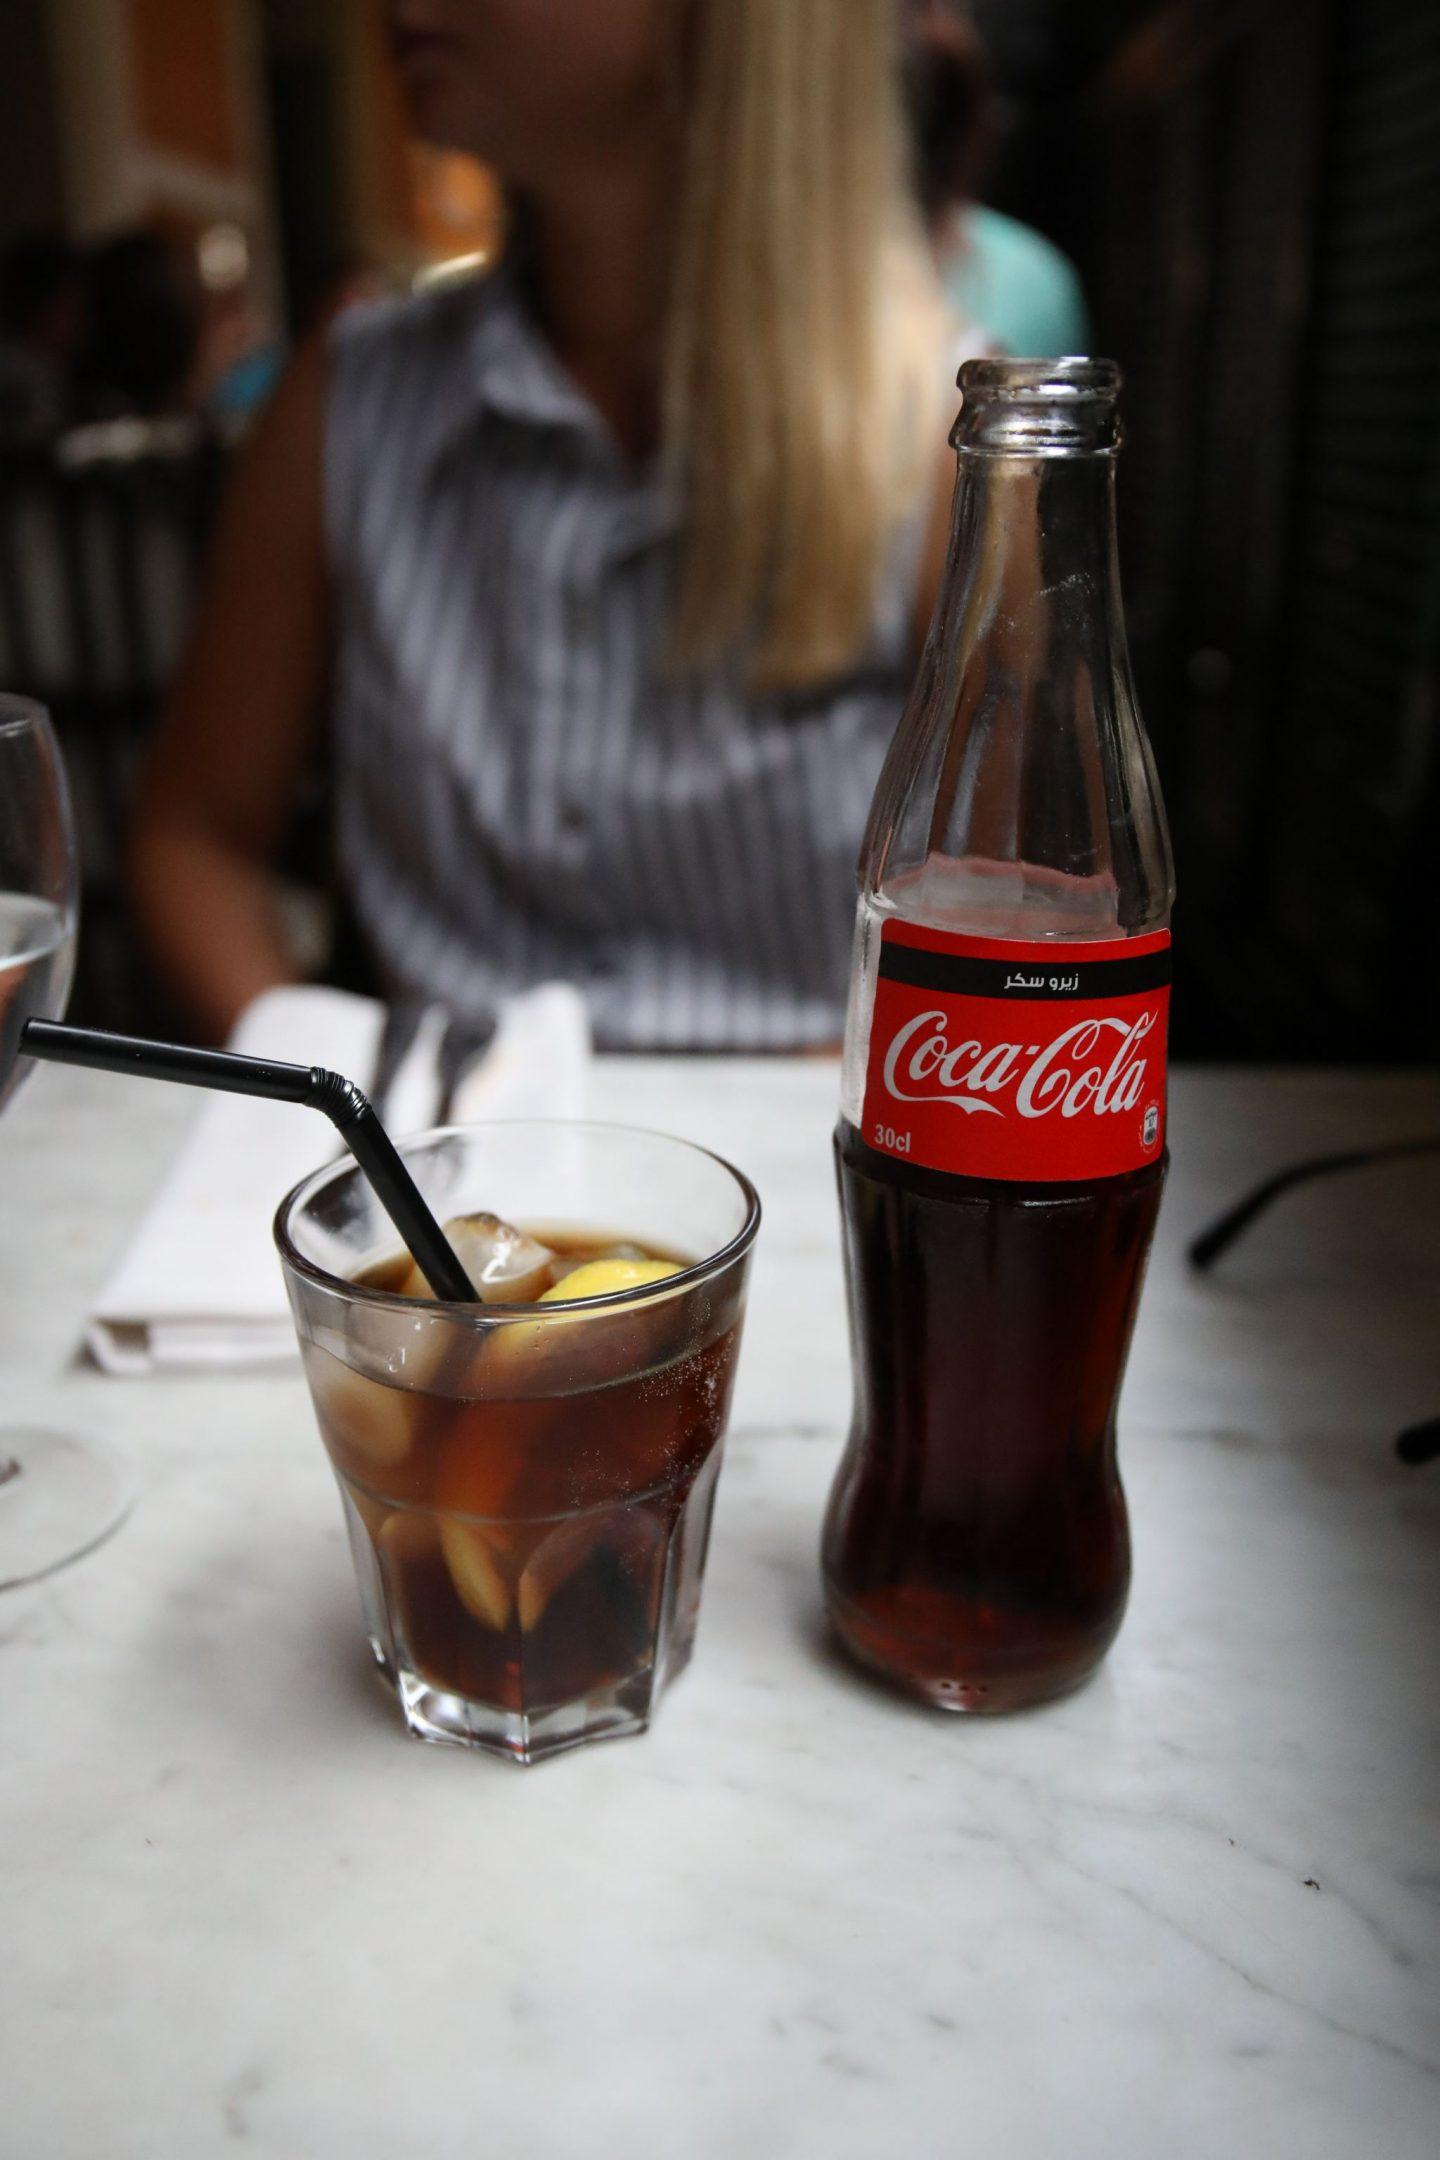 Katie KALANCHOE, Marrakech, Grande Cafe de la poste